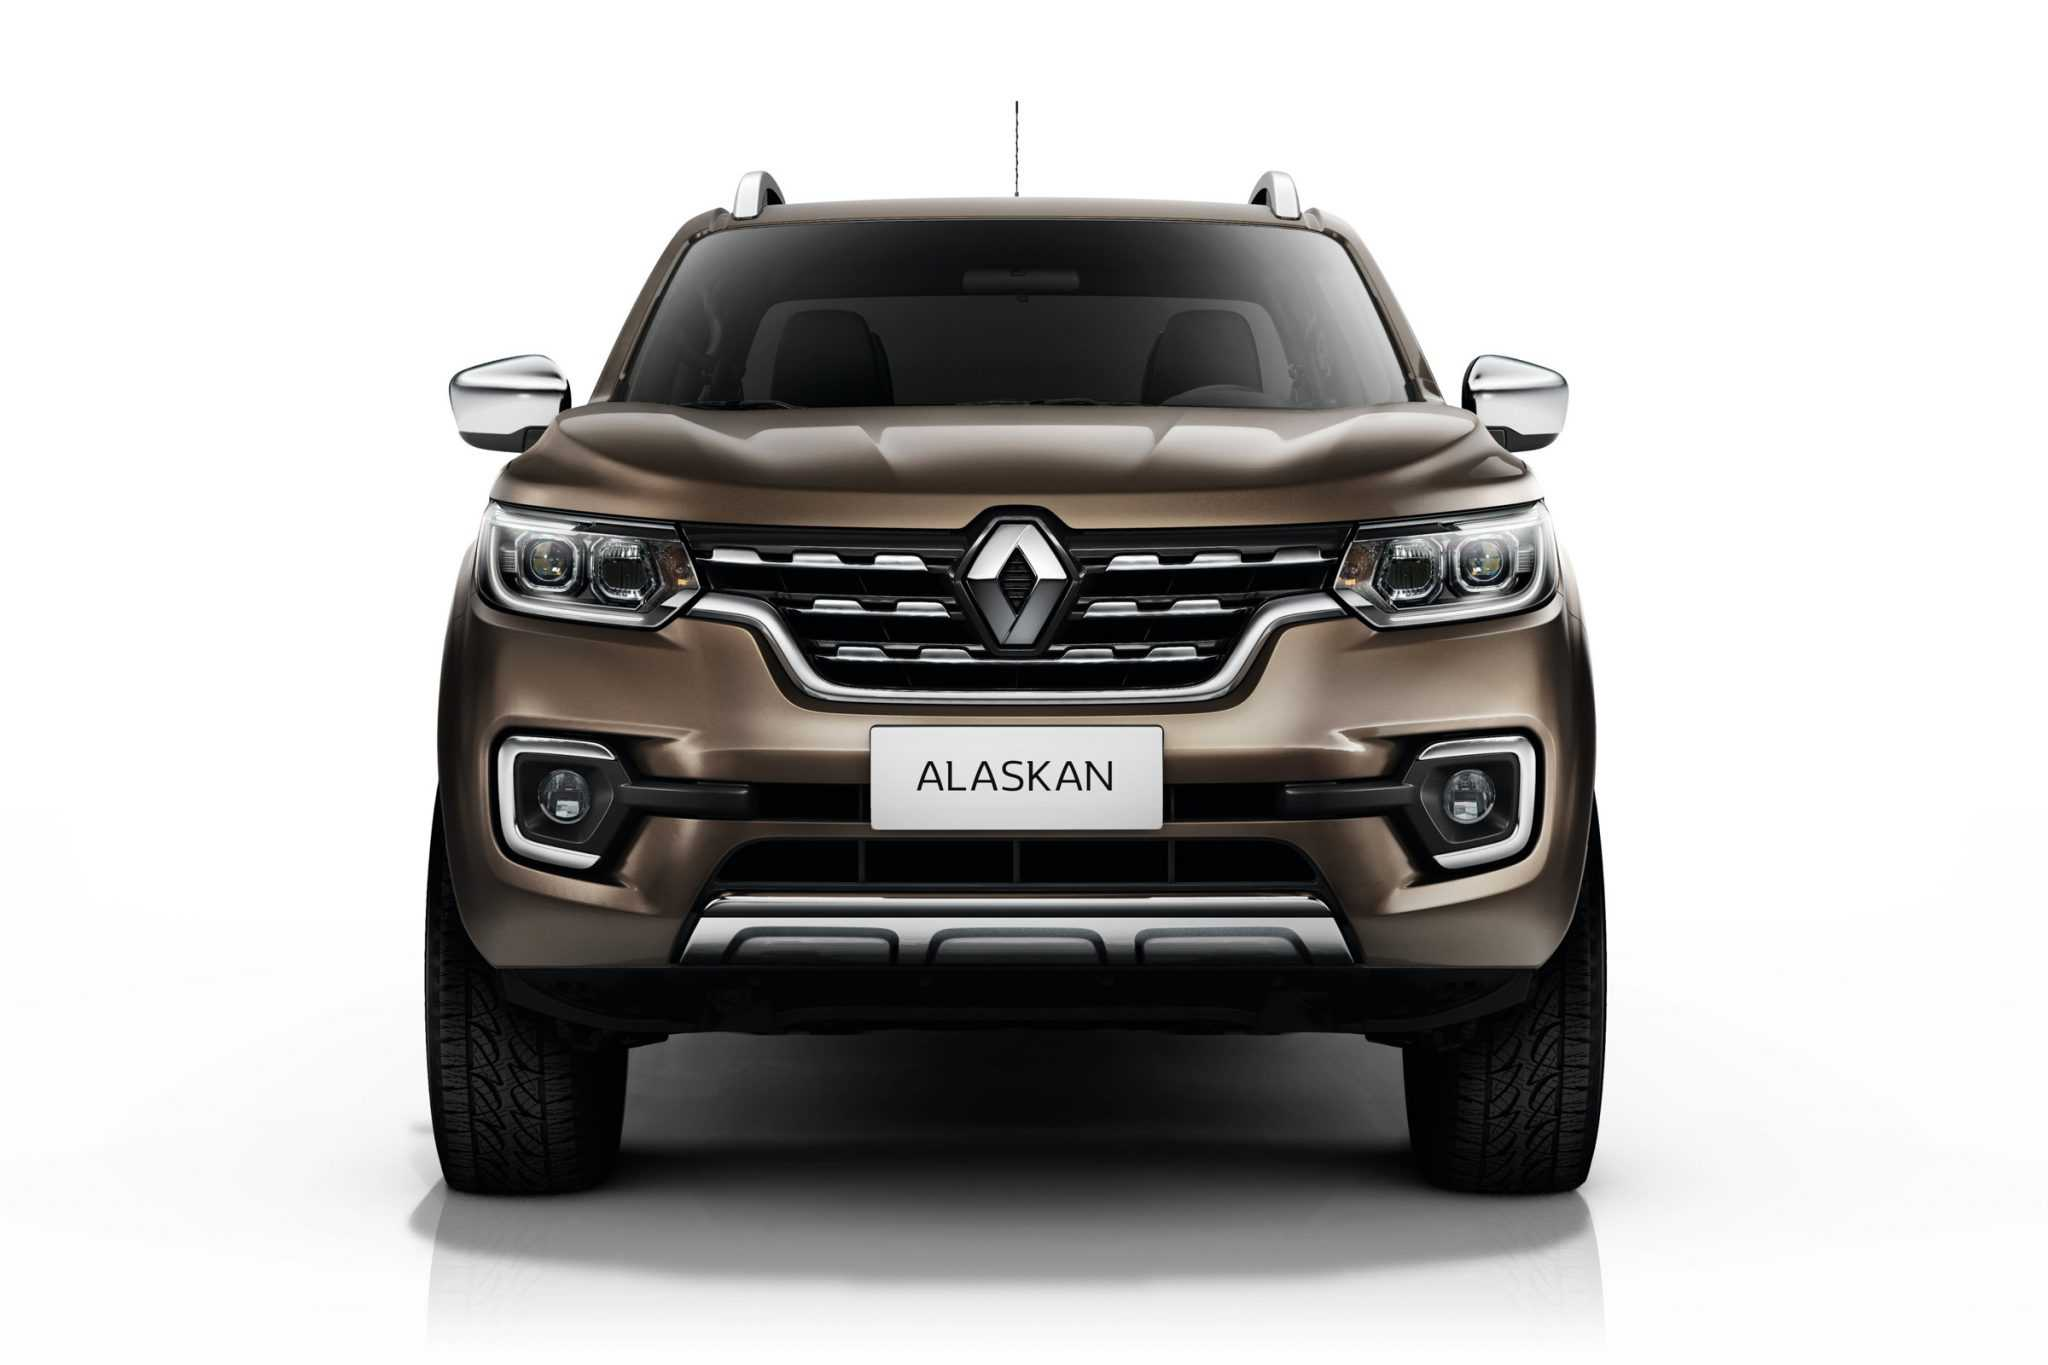 2017 Renault Alaskan Pick-up Truck – Details and Specs